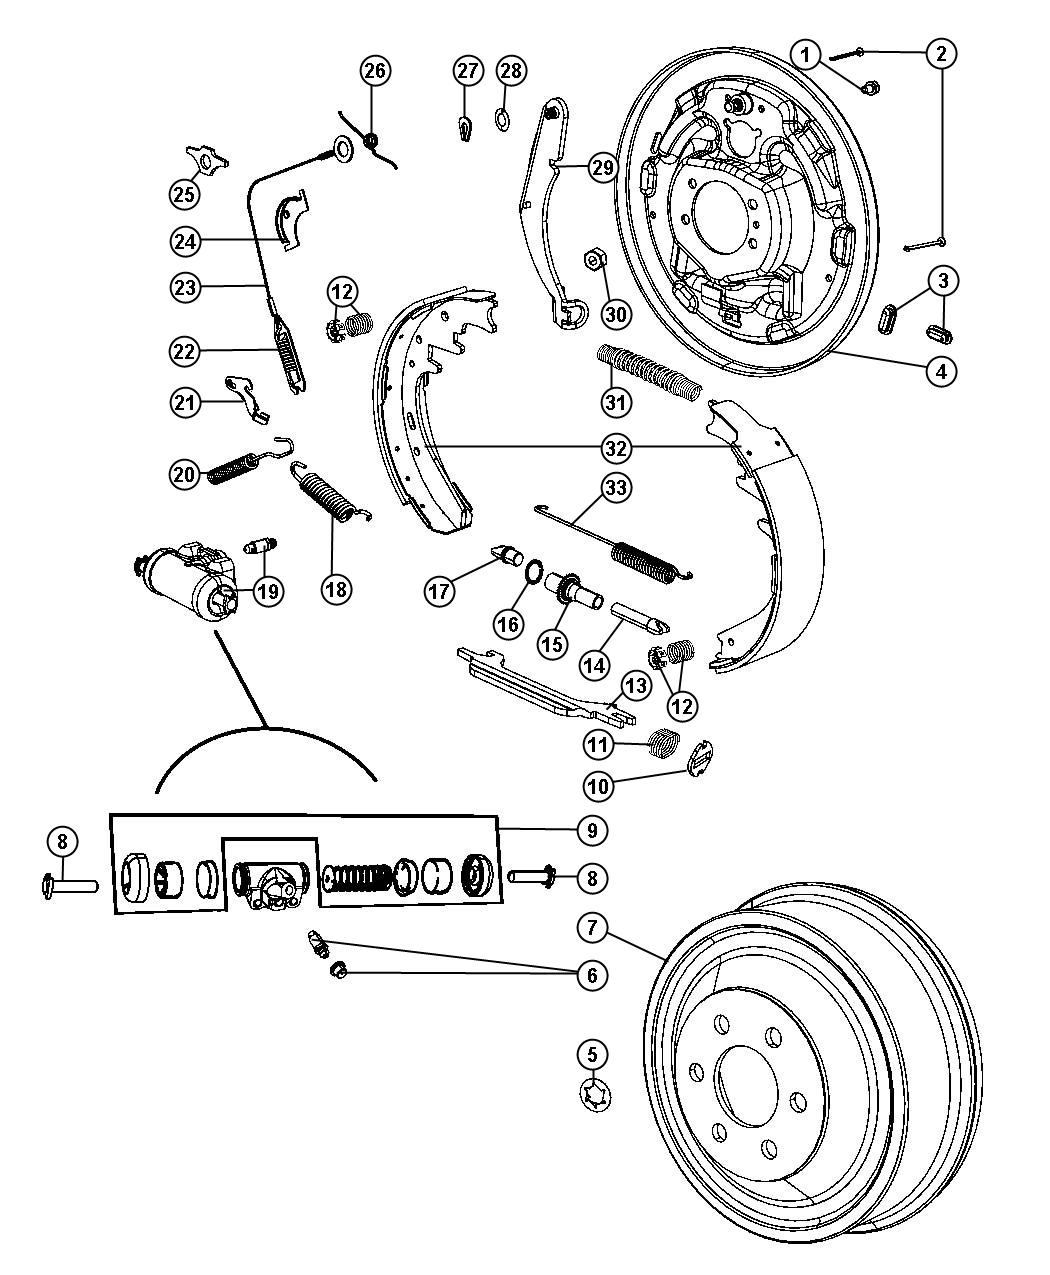 chrysler 8 25 axle diagram